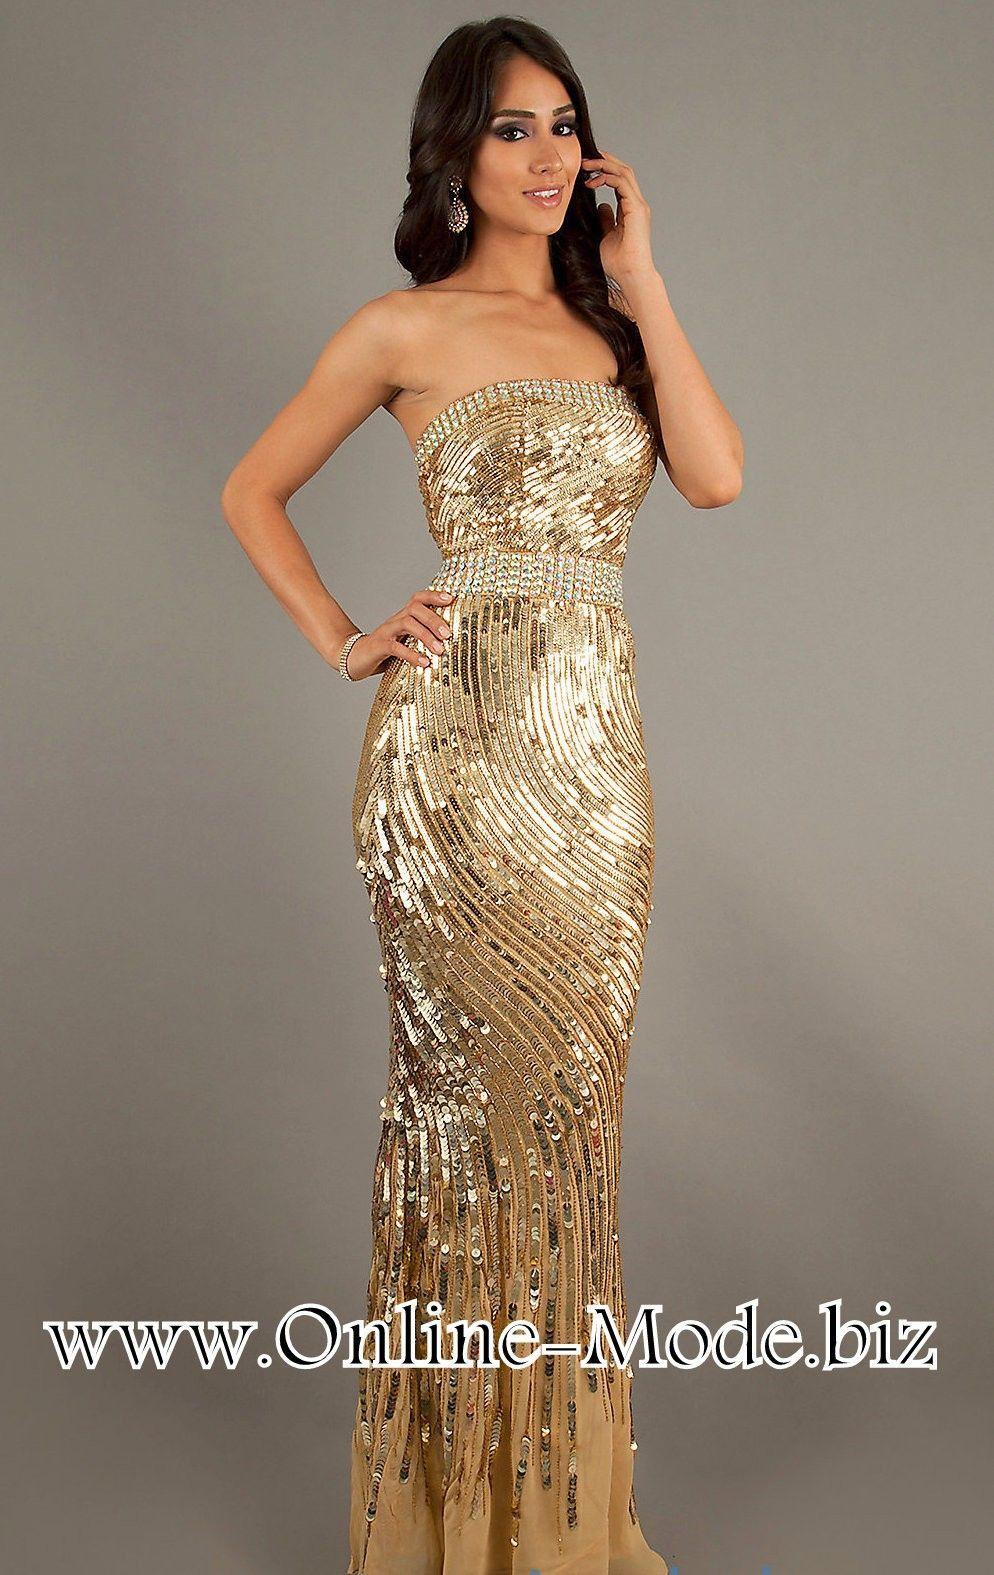 Trägerloses Bustie Abendkleid in Gold #abendkleid #abendmode